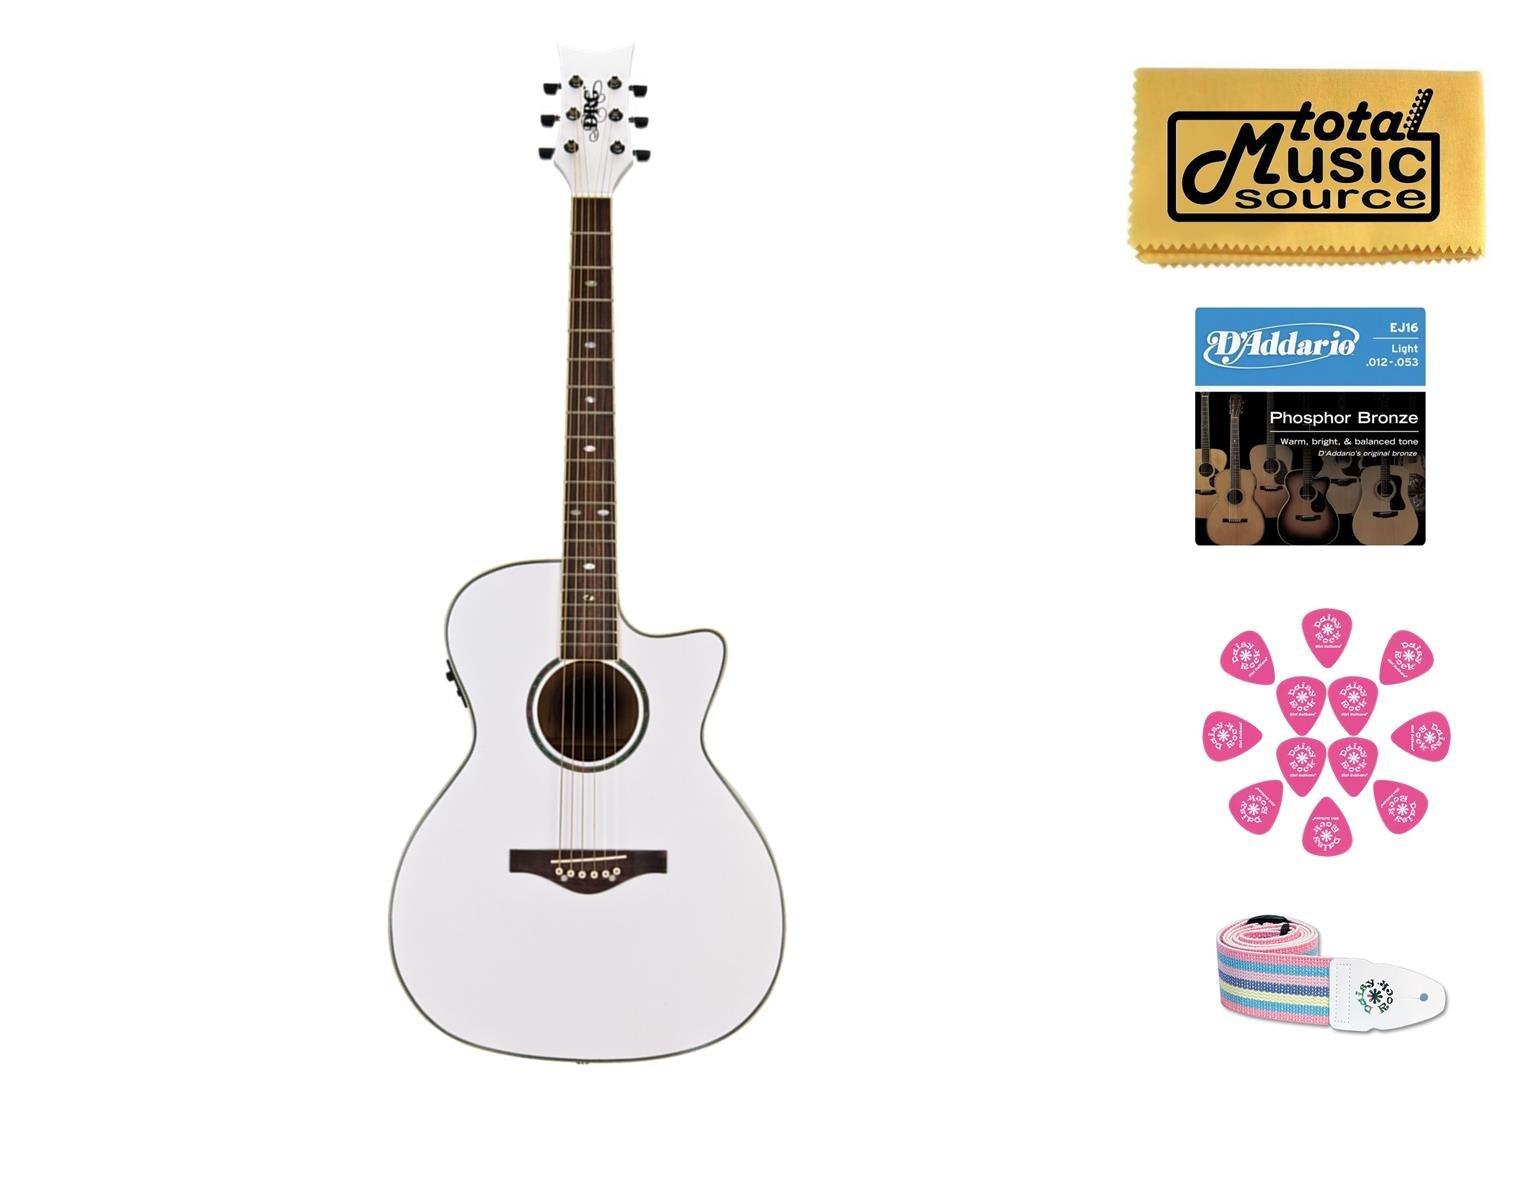 DAISY ROCK Wildwood Artist Acoustic Electric Guitar, Fishman, Pearl, 14-6274 by daisy rock